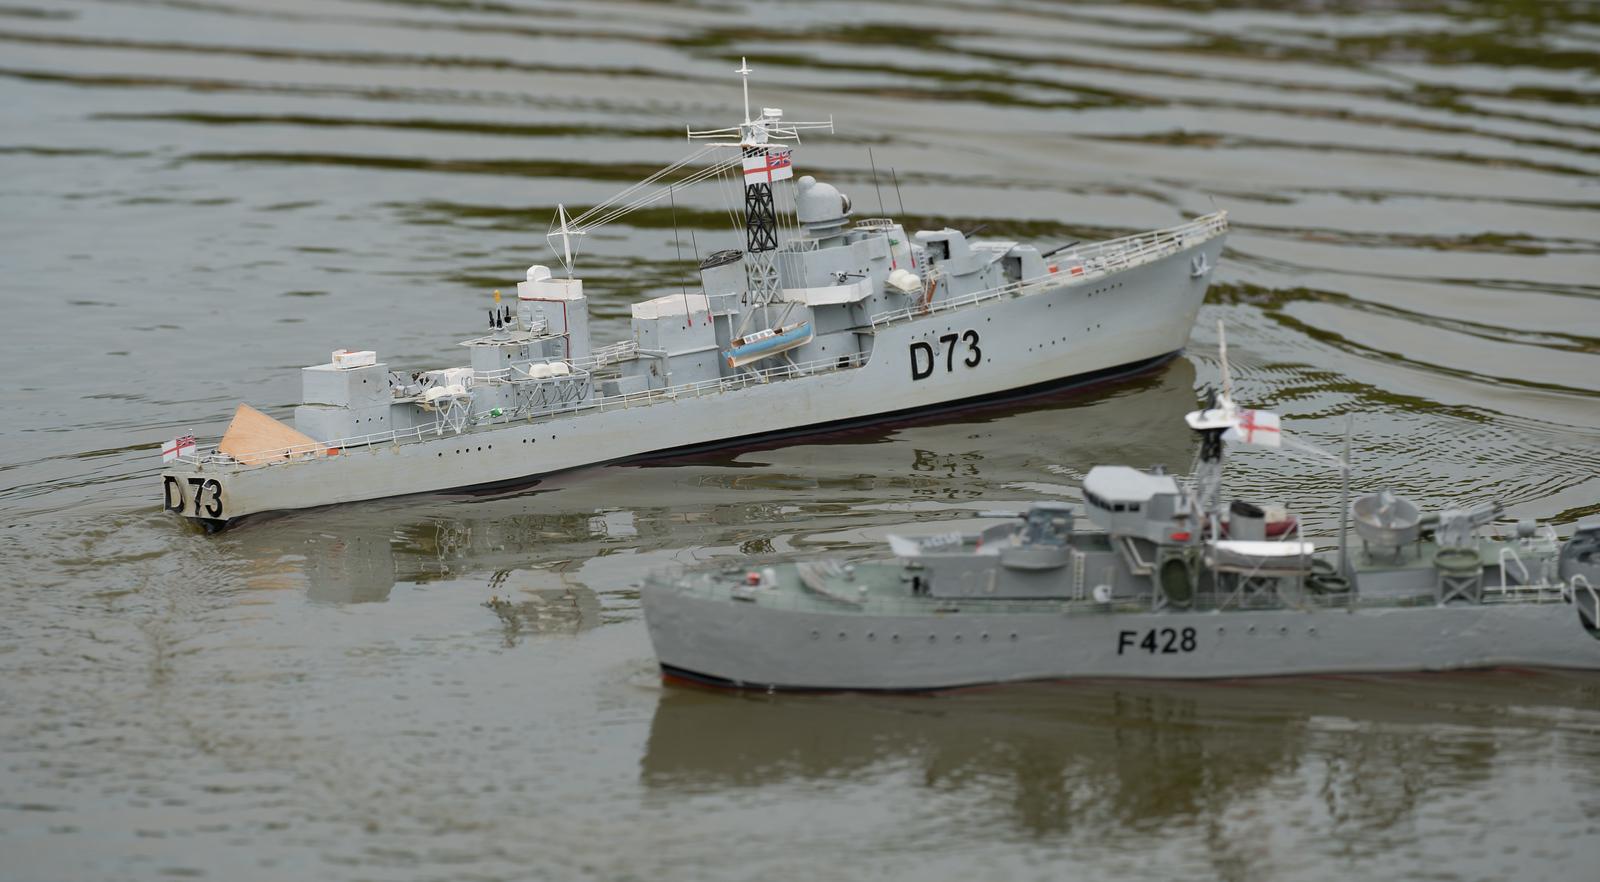 C-Class Destroyer, D73, F428, Frigate, HMS Cavalier, HMS Loch Alvie, Navy Day 2017, Richard Coombs, SRCMBC, Setley Pond, Solent Radio Control Model Boat Club